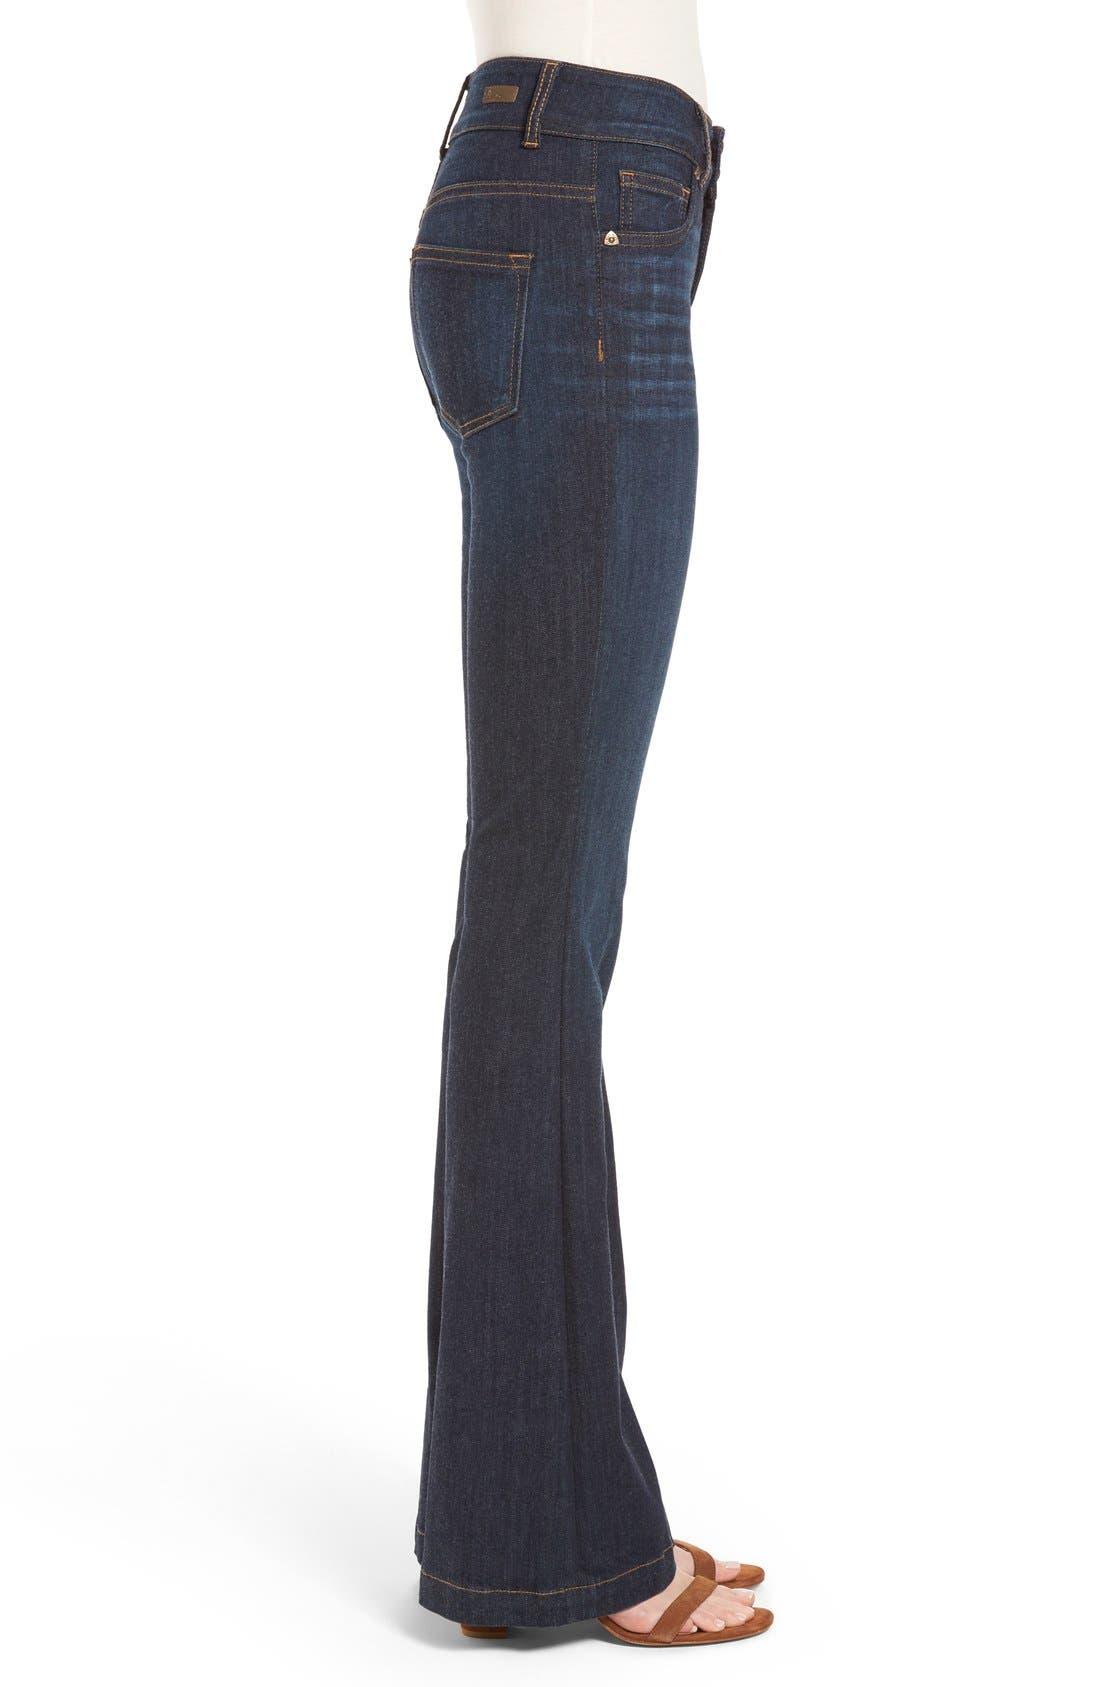 Alternate Image 3  - KUT from the Kloth 'Chrissy' Flare Leg Jeans (Brightness)